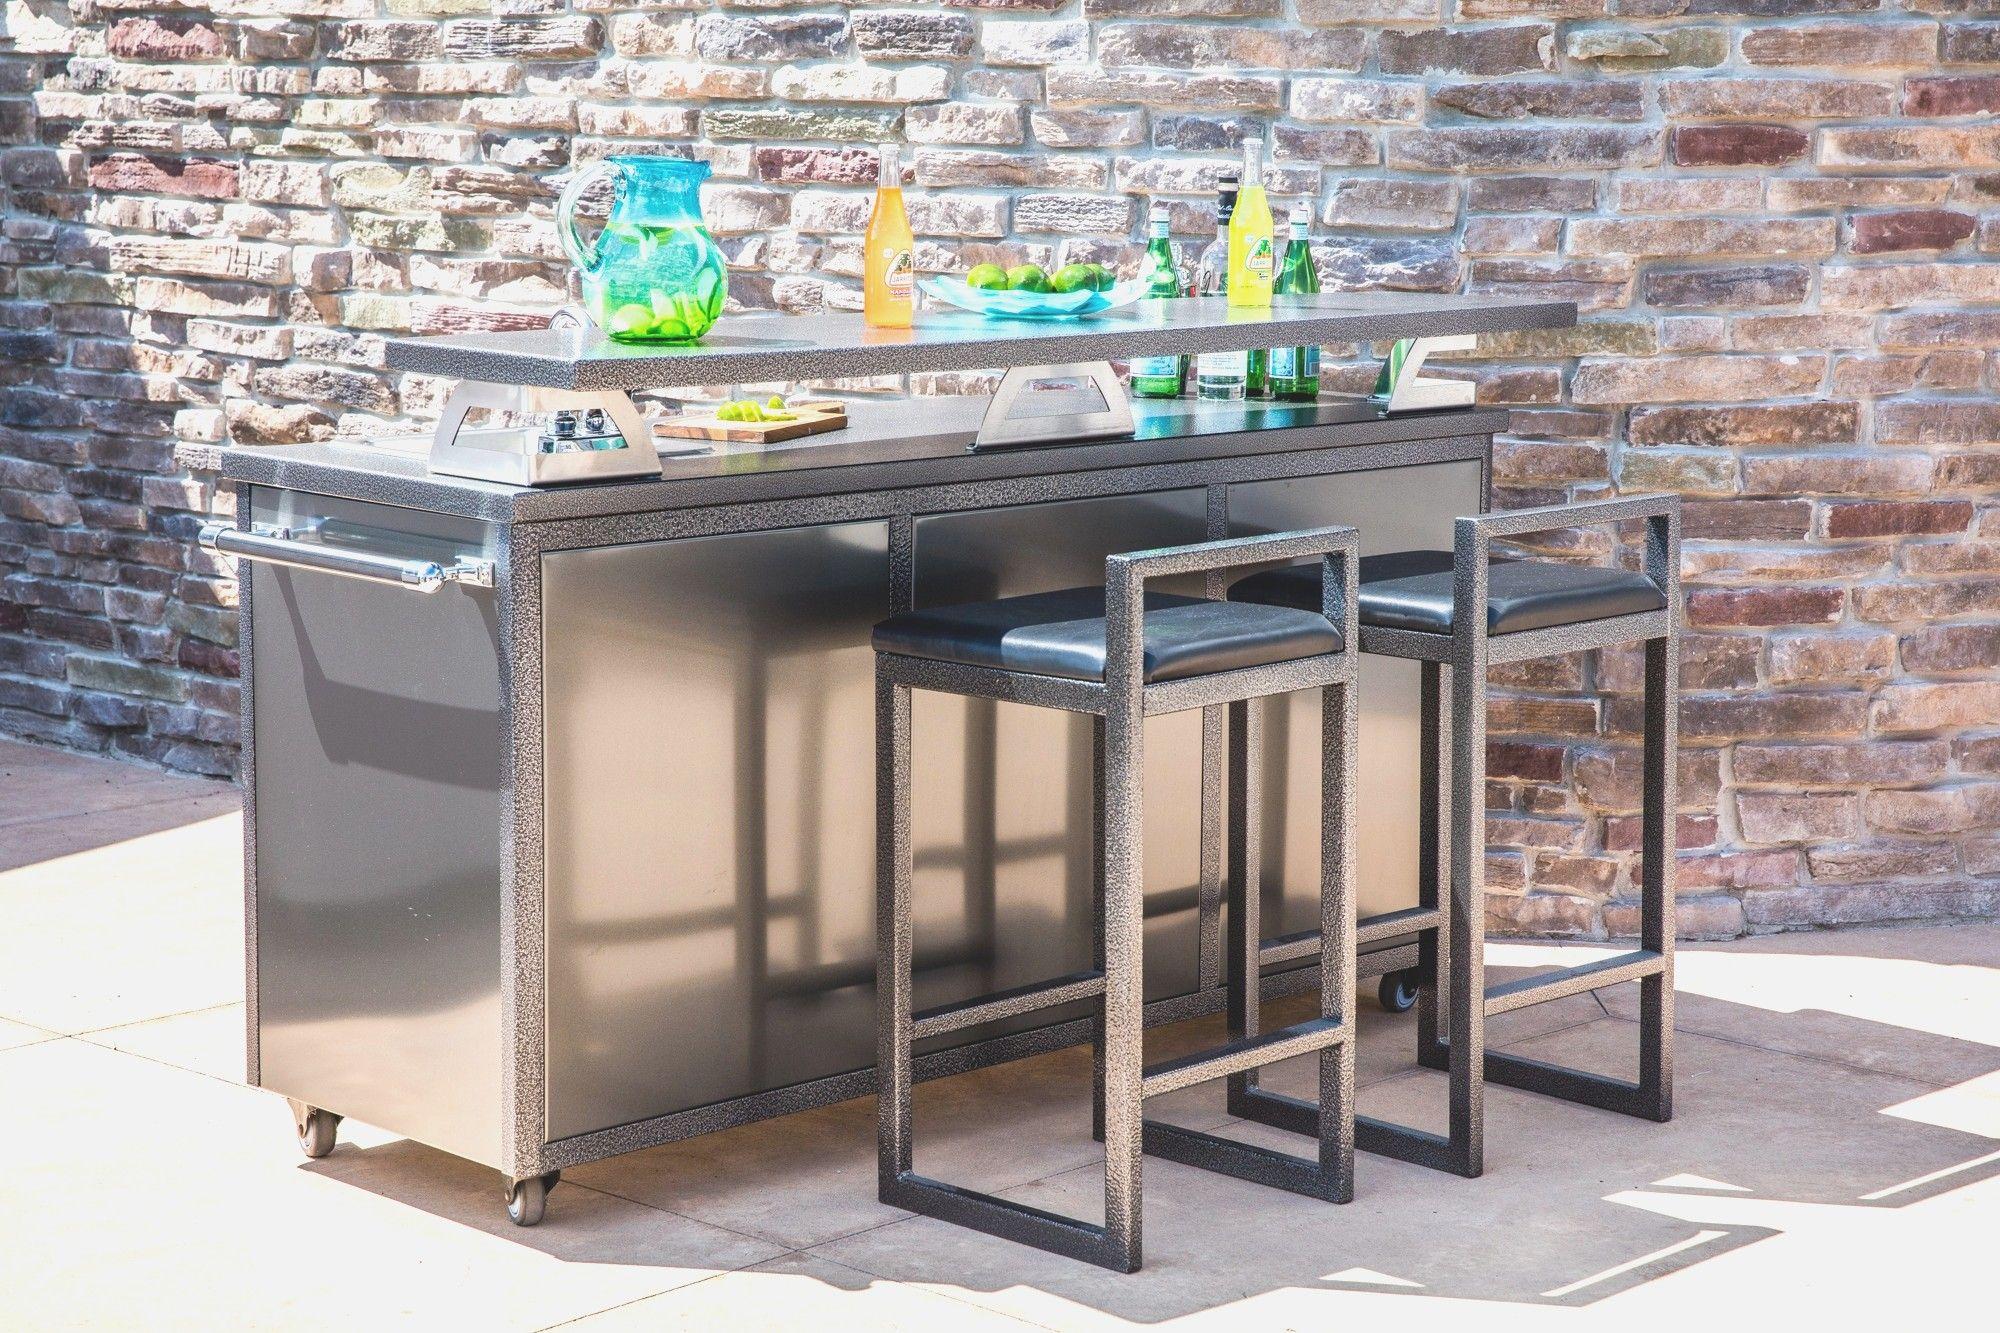 Prefab Outdoor Kitchen Grill Islands Prefab Backyard Apartment - Prefab outdoor kitchen grill islands